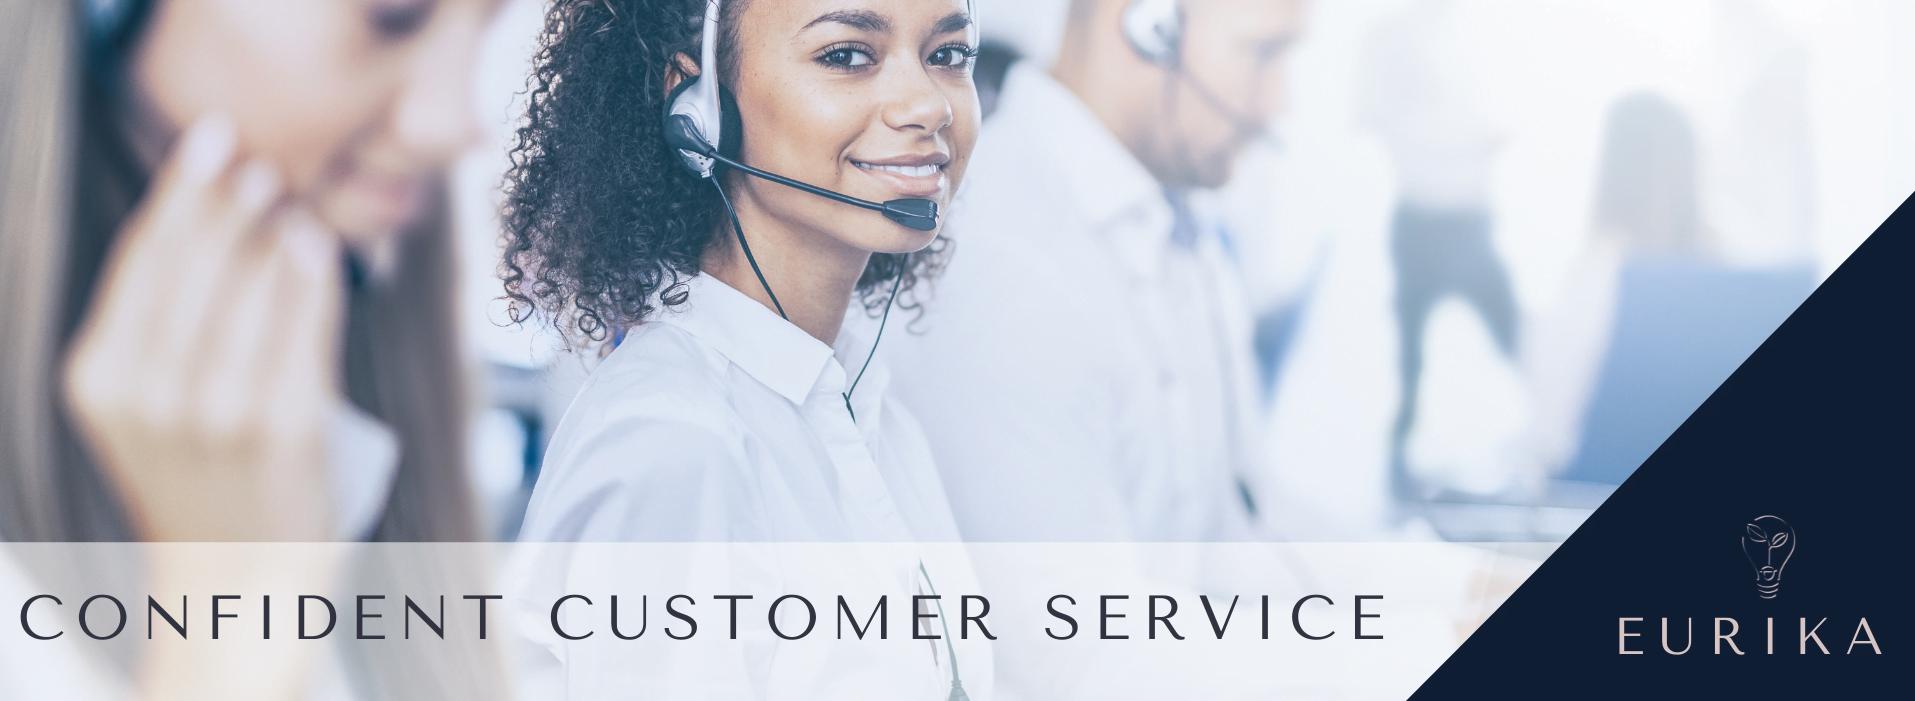 Confident customer service course outline eurika northamptonshire, buckinghamshire, london, warwickshire, leicestershire